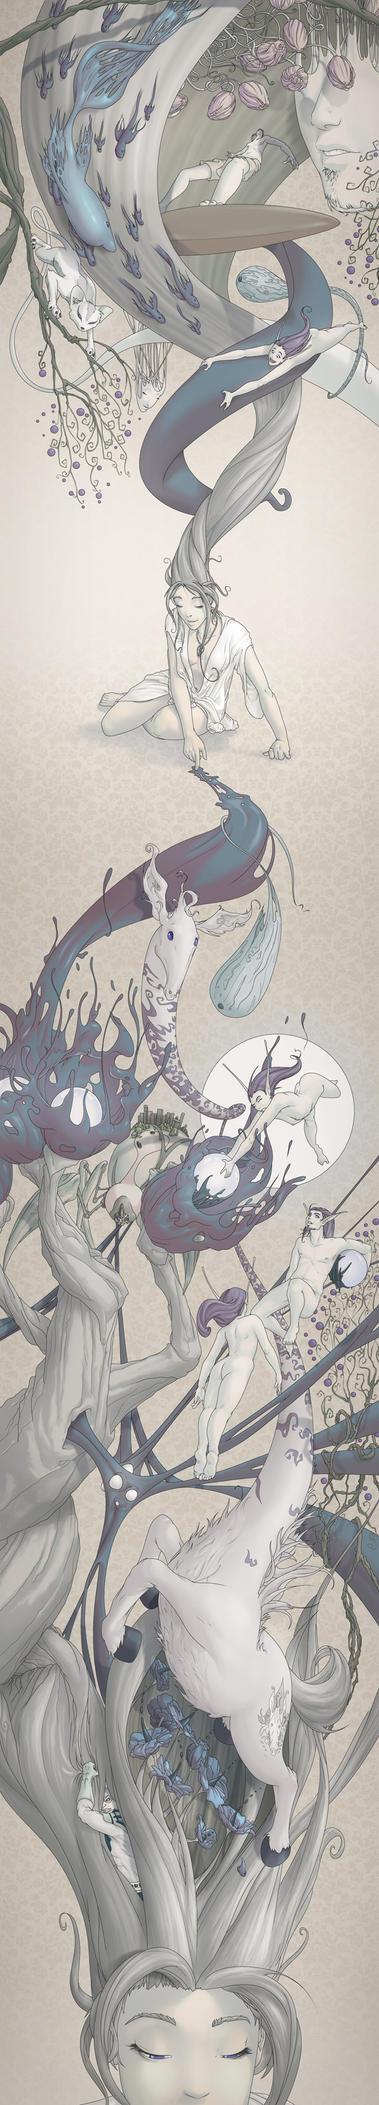 ilustracion relarga by il-lichu